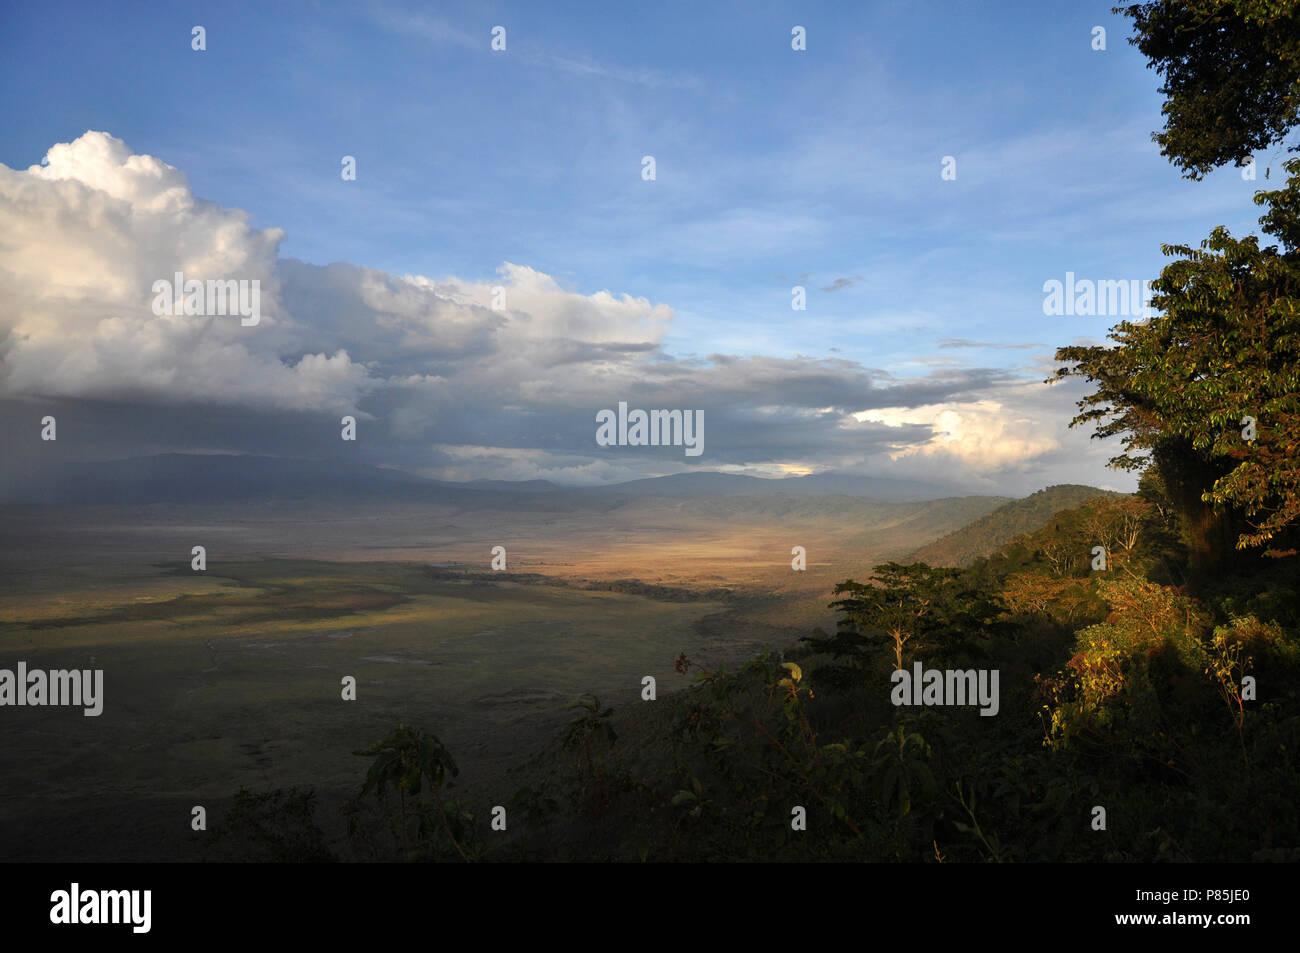 Ngorongoro krater, Ngorongoro crater (Tanzania) - Stock Image